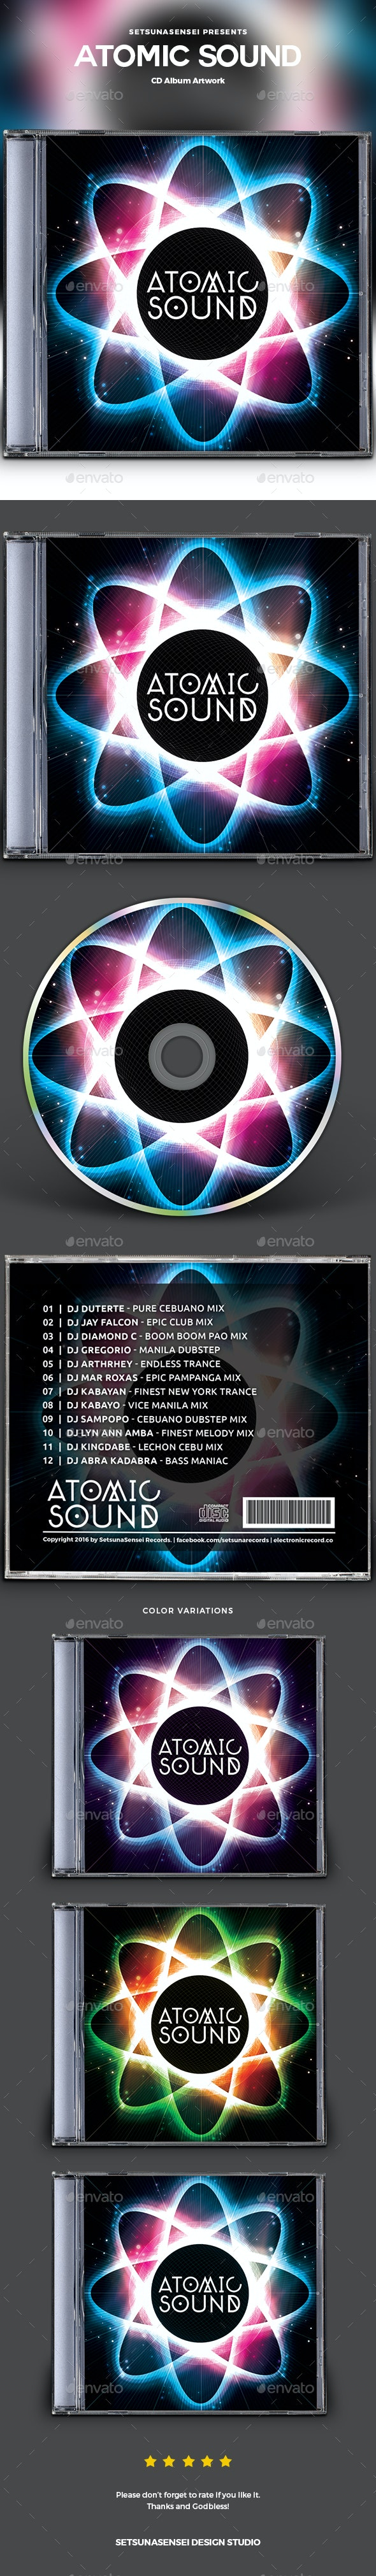 Atomic Sound CD Album Artwork